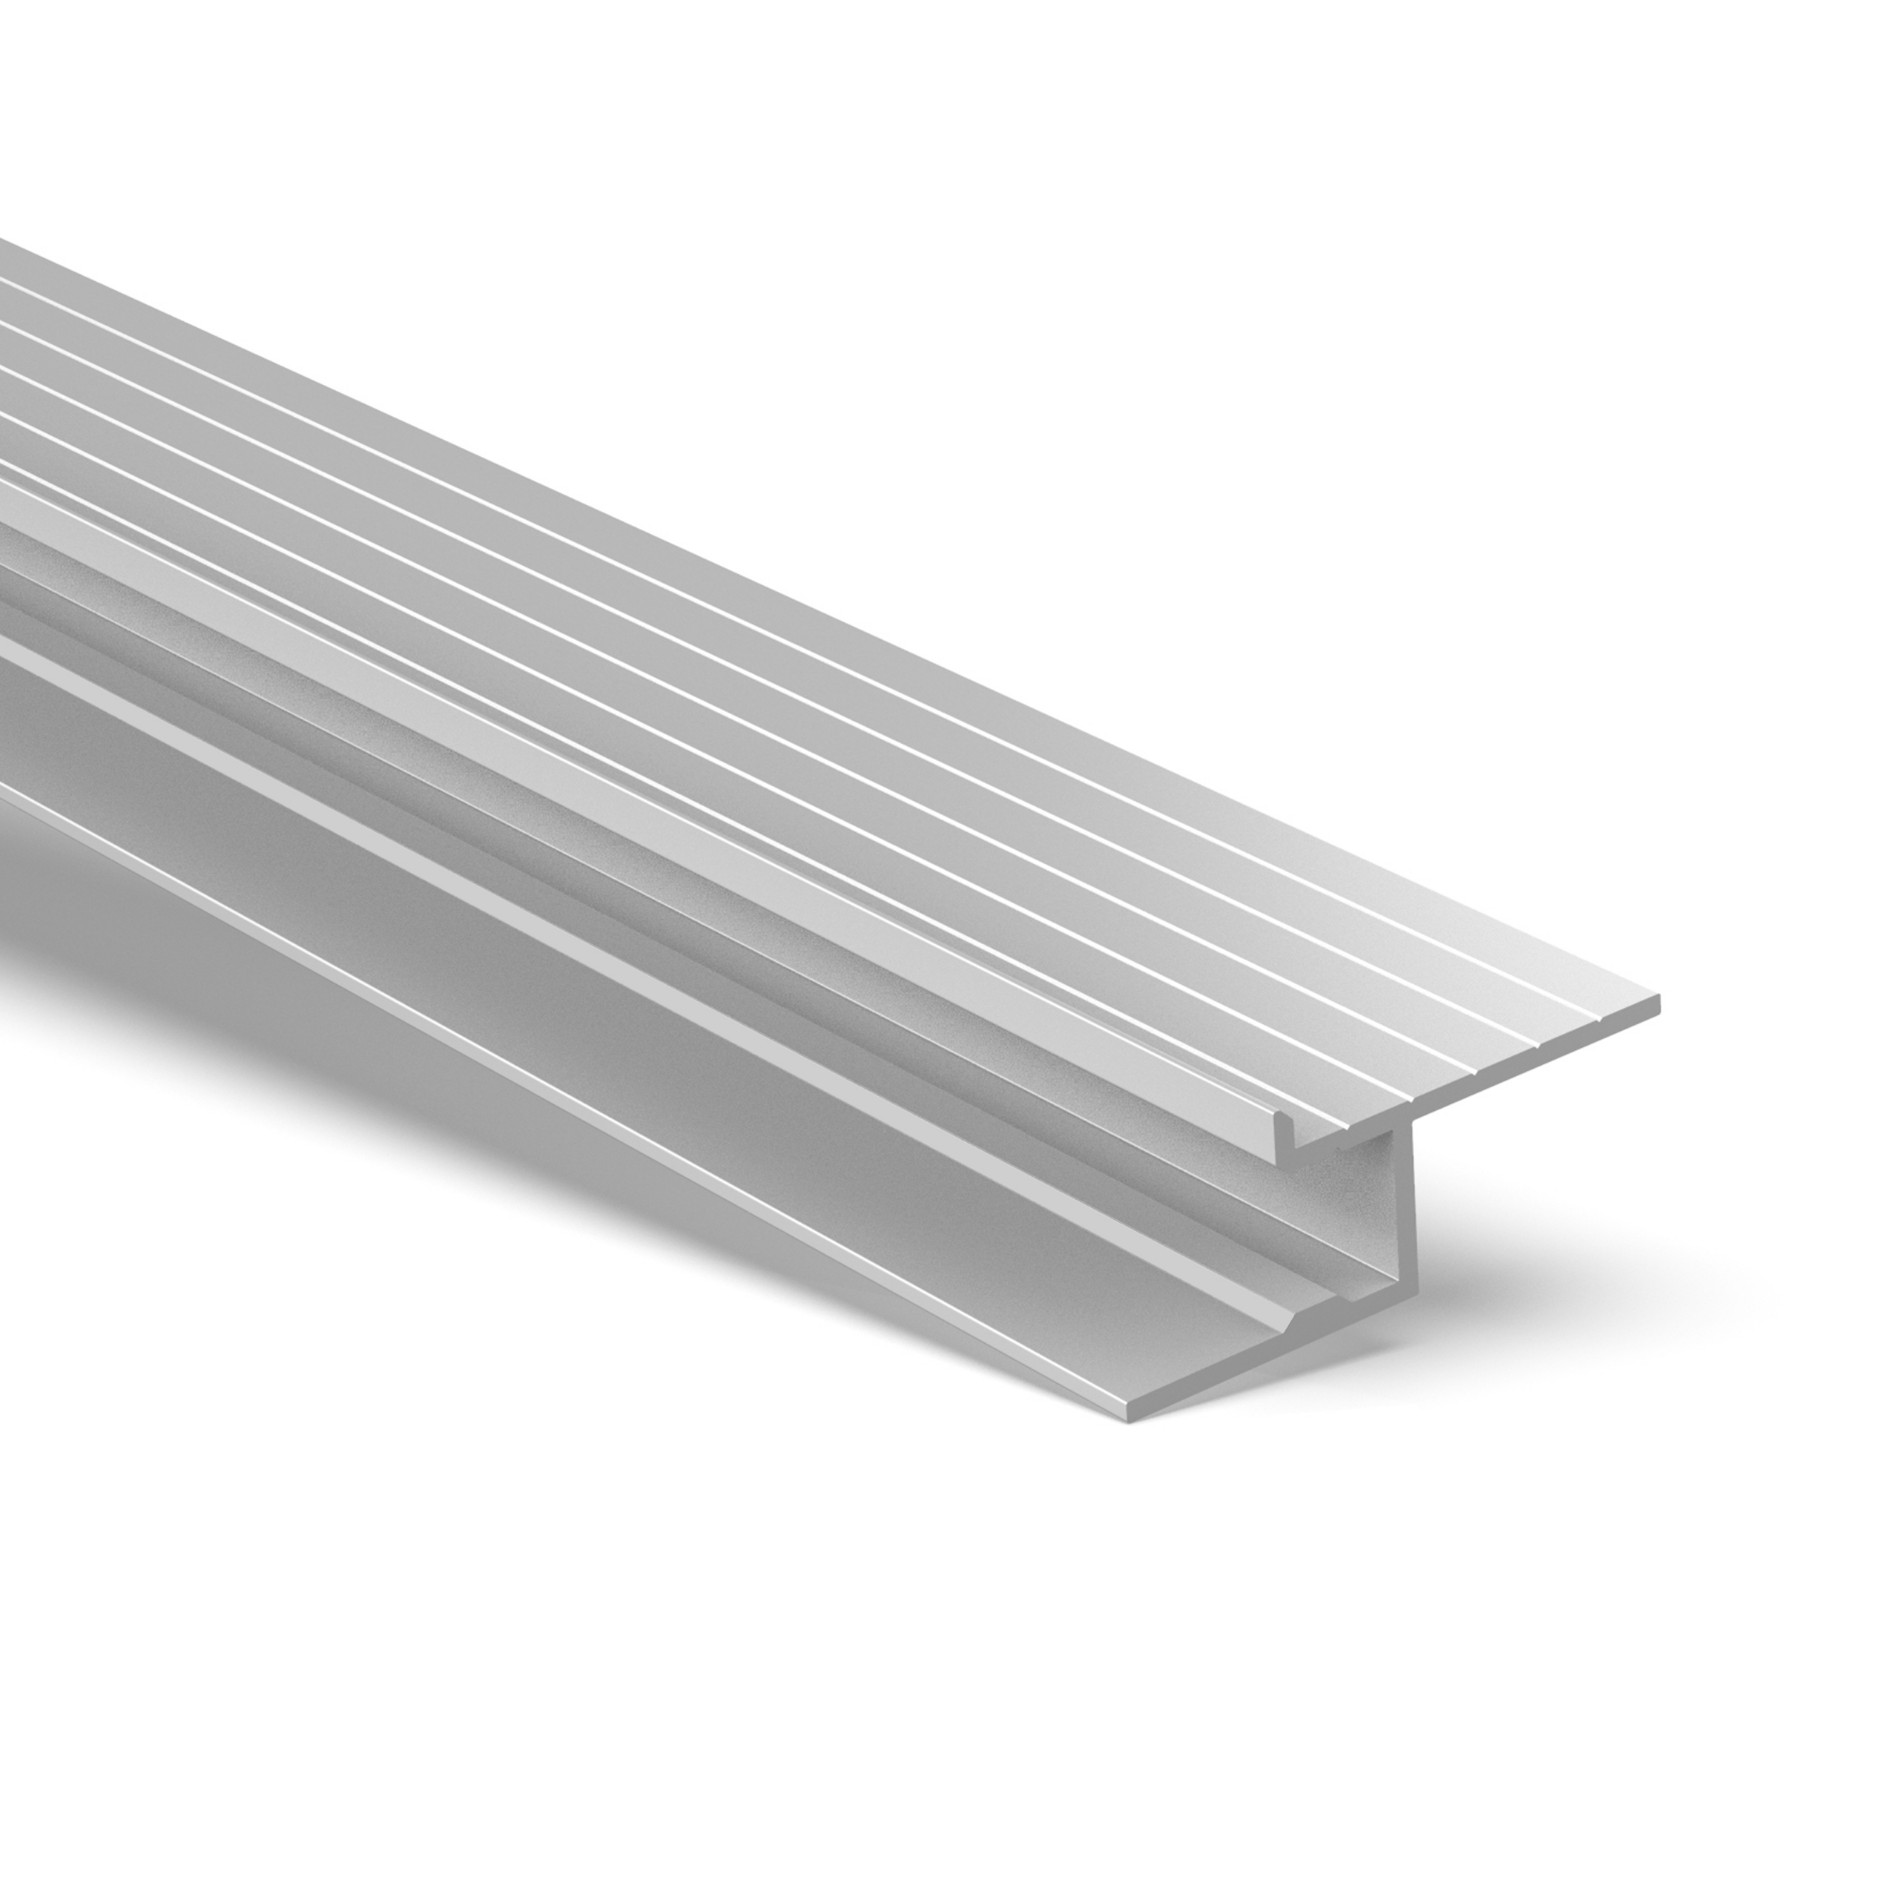 CT8 Trimless Aluminium Extrusions for cove ceilings 42.5x12mm